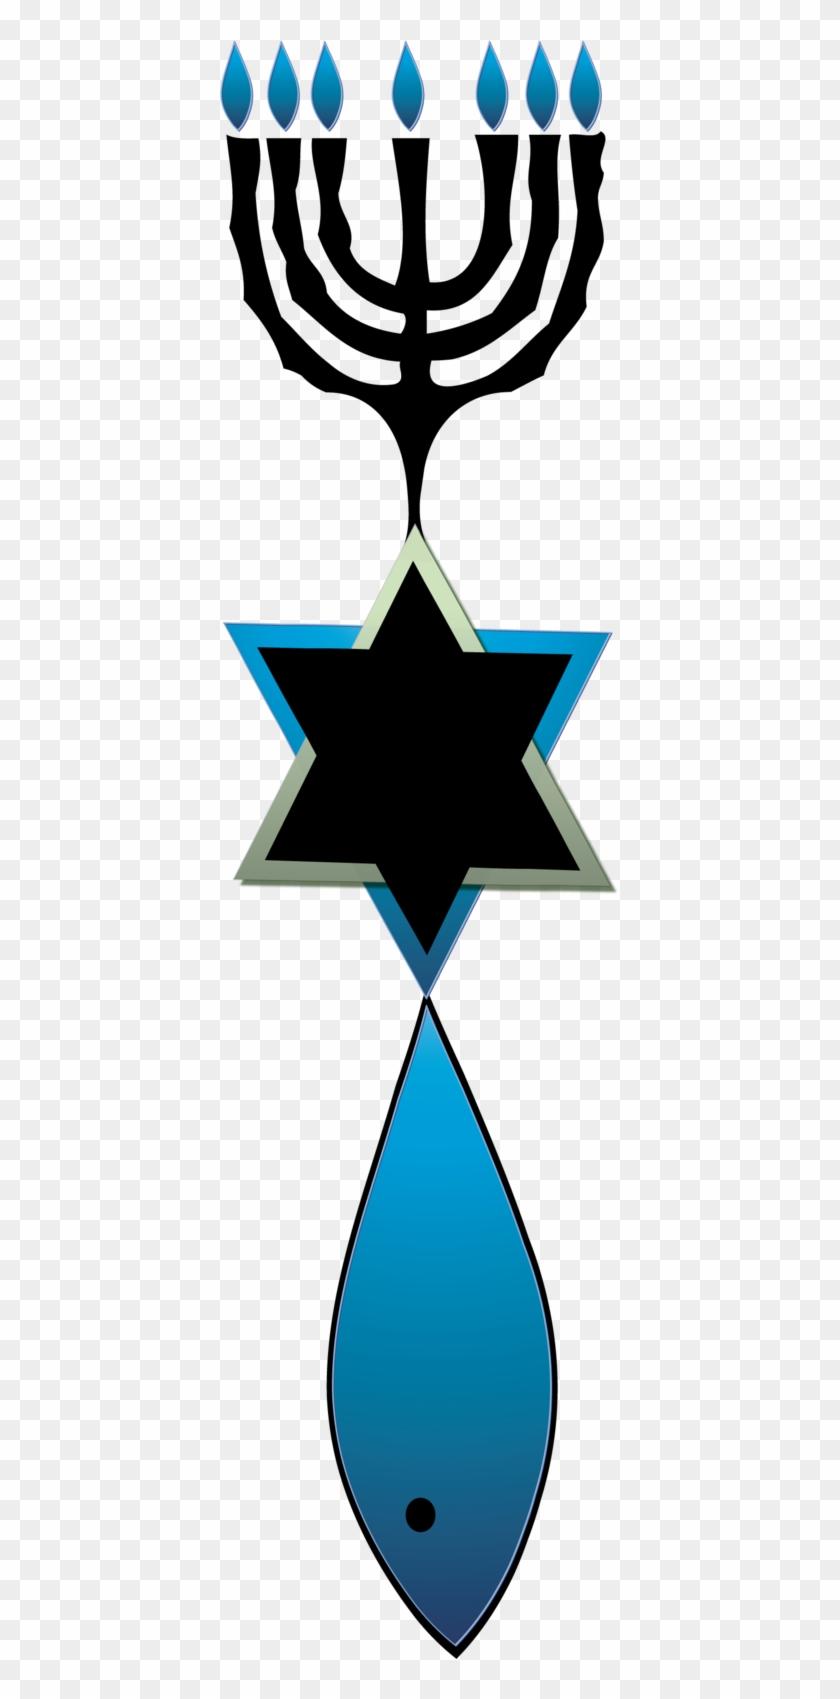 Messianic Christian Jew Art 19 By Madetobeunique Messianic Jewish